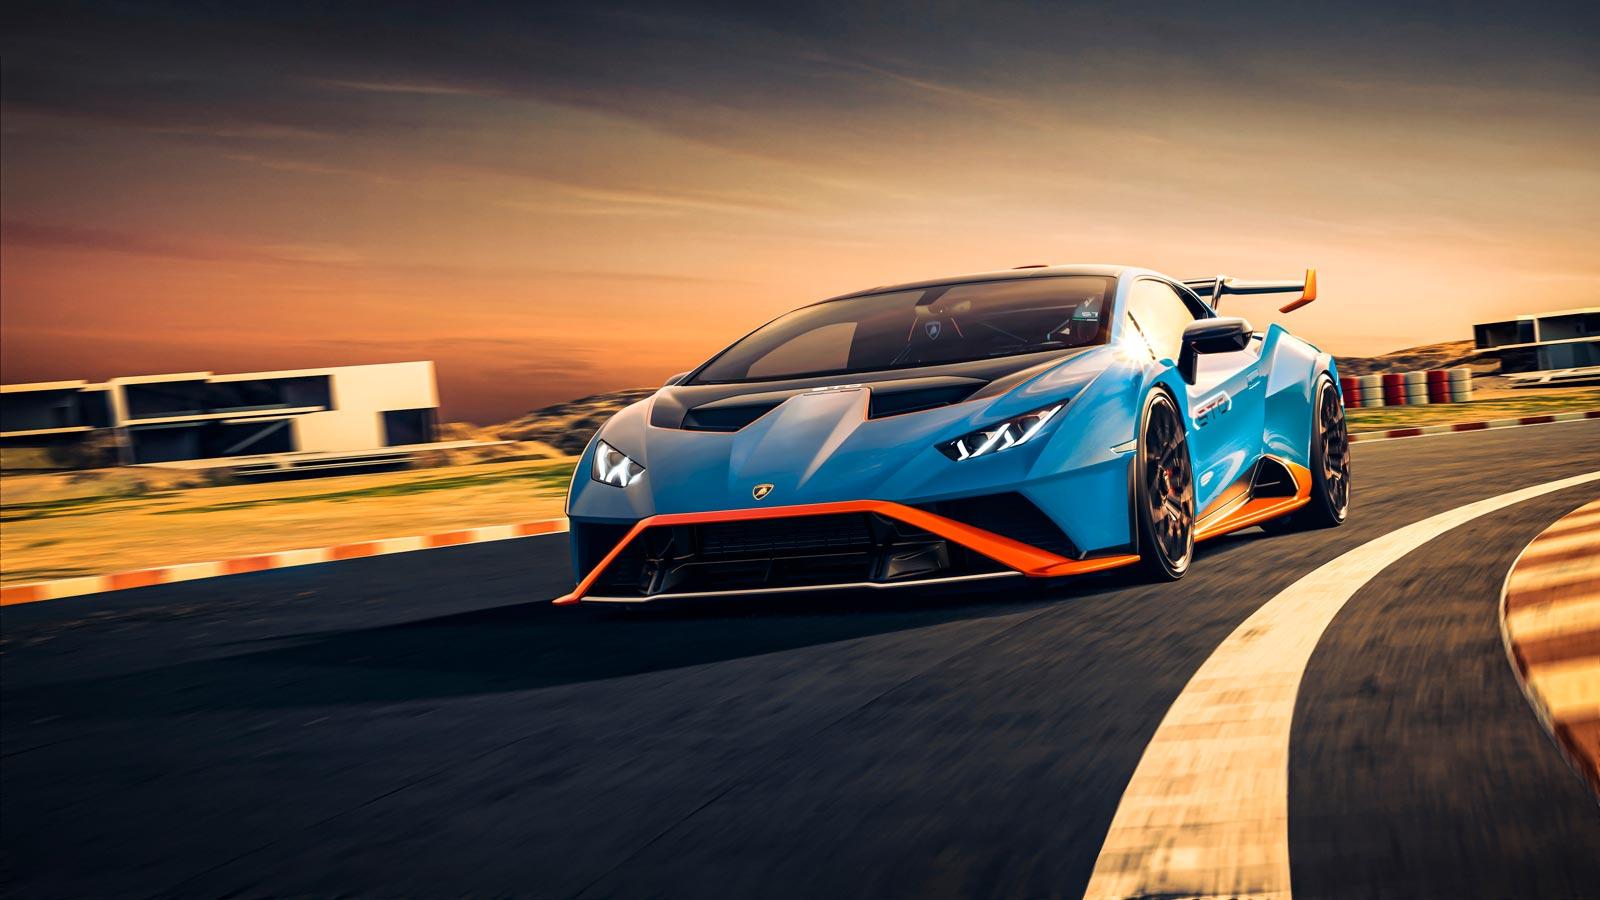 Lamborghini Huracan STO - From racetrack to road image 9